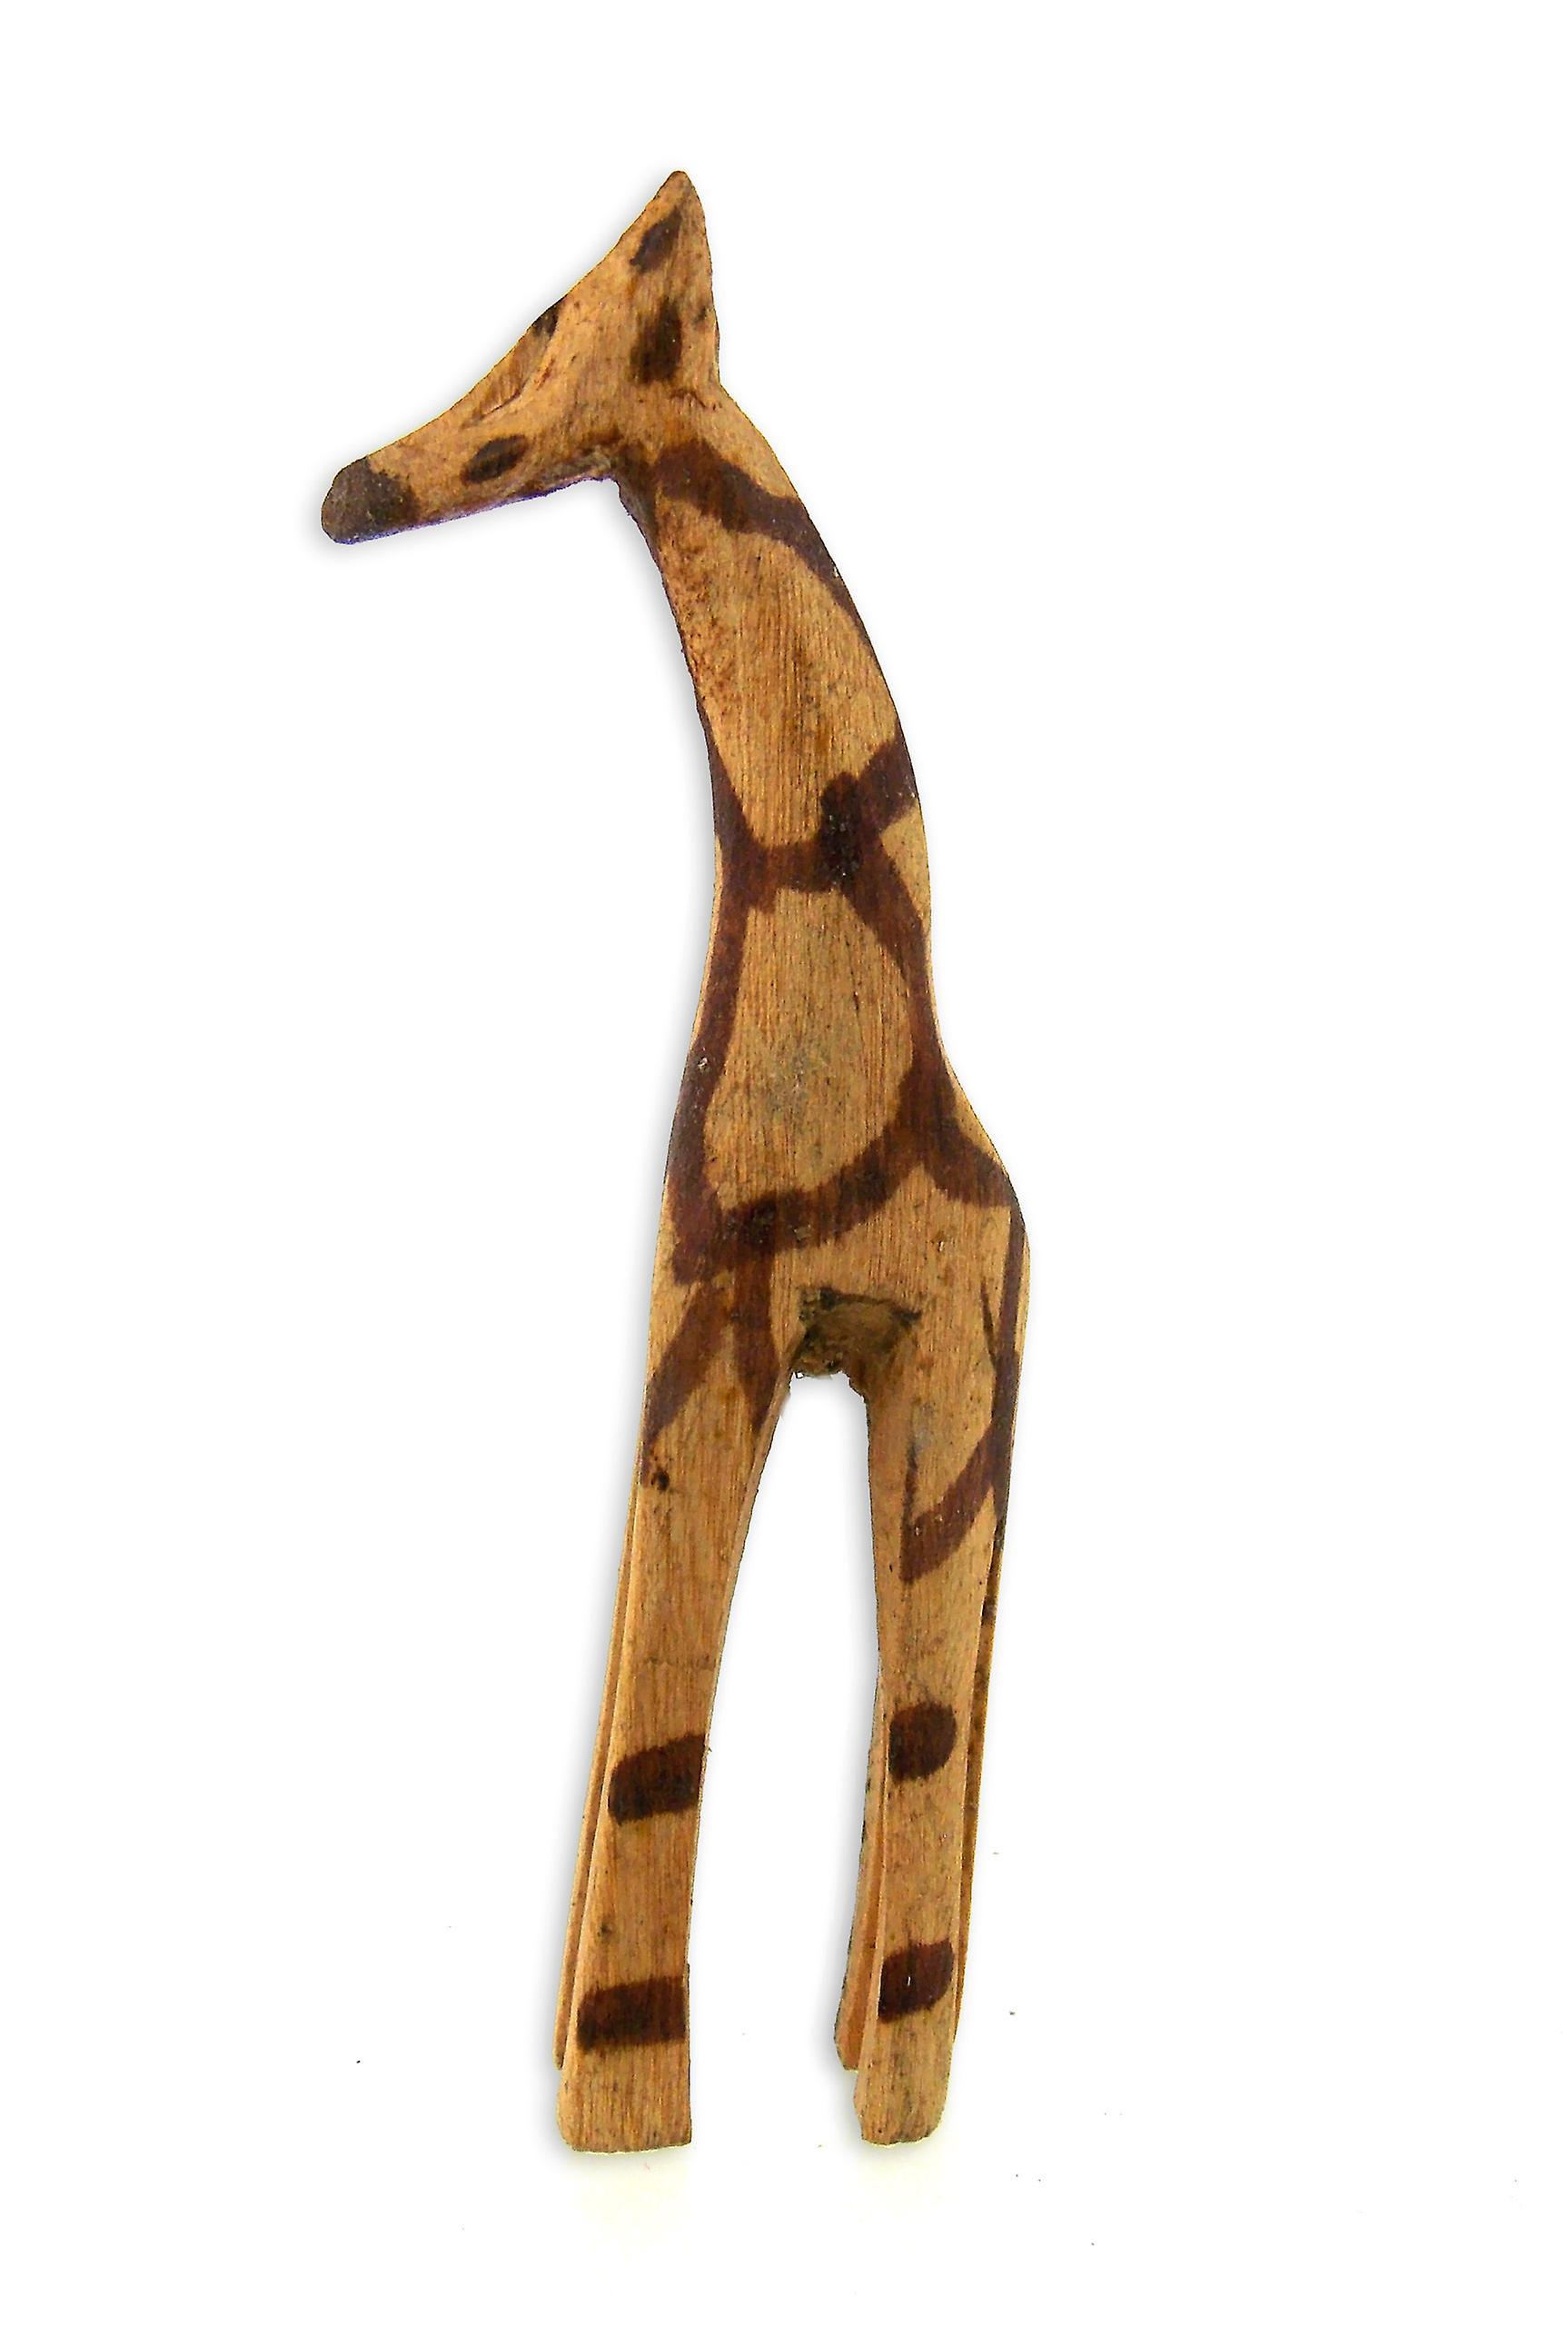 Wooden Giraffe Figurine Family - 3 Piece Set